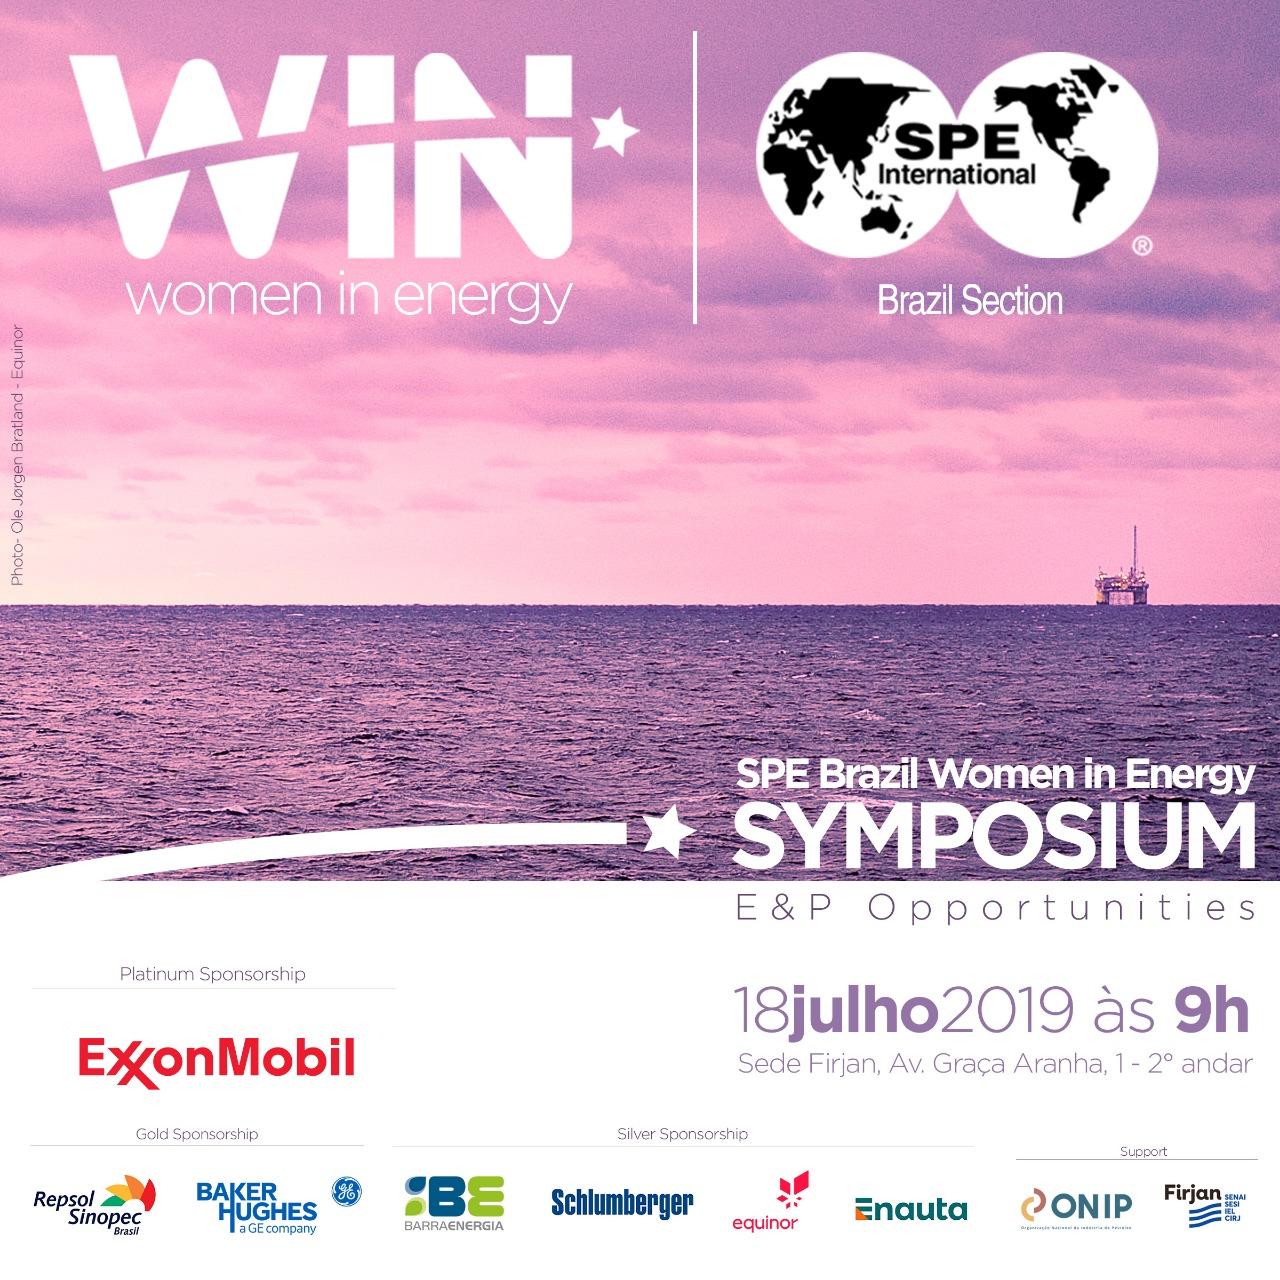 SPE Brazil Women in Energy Symposium: E&P Opportunities